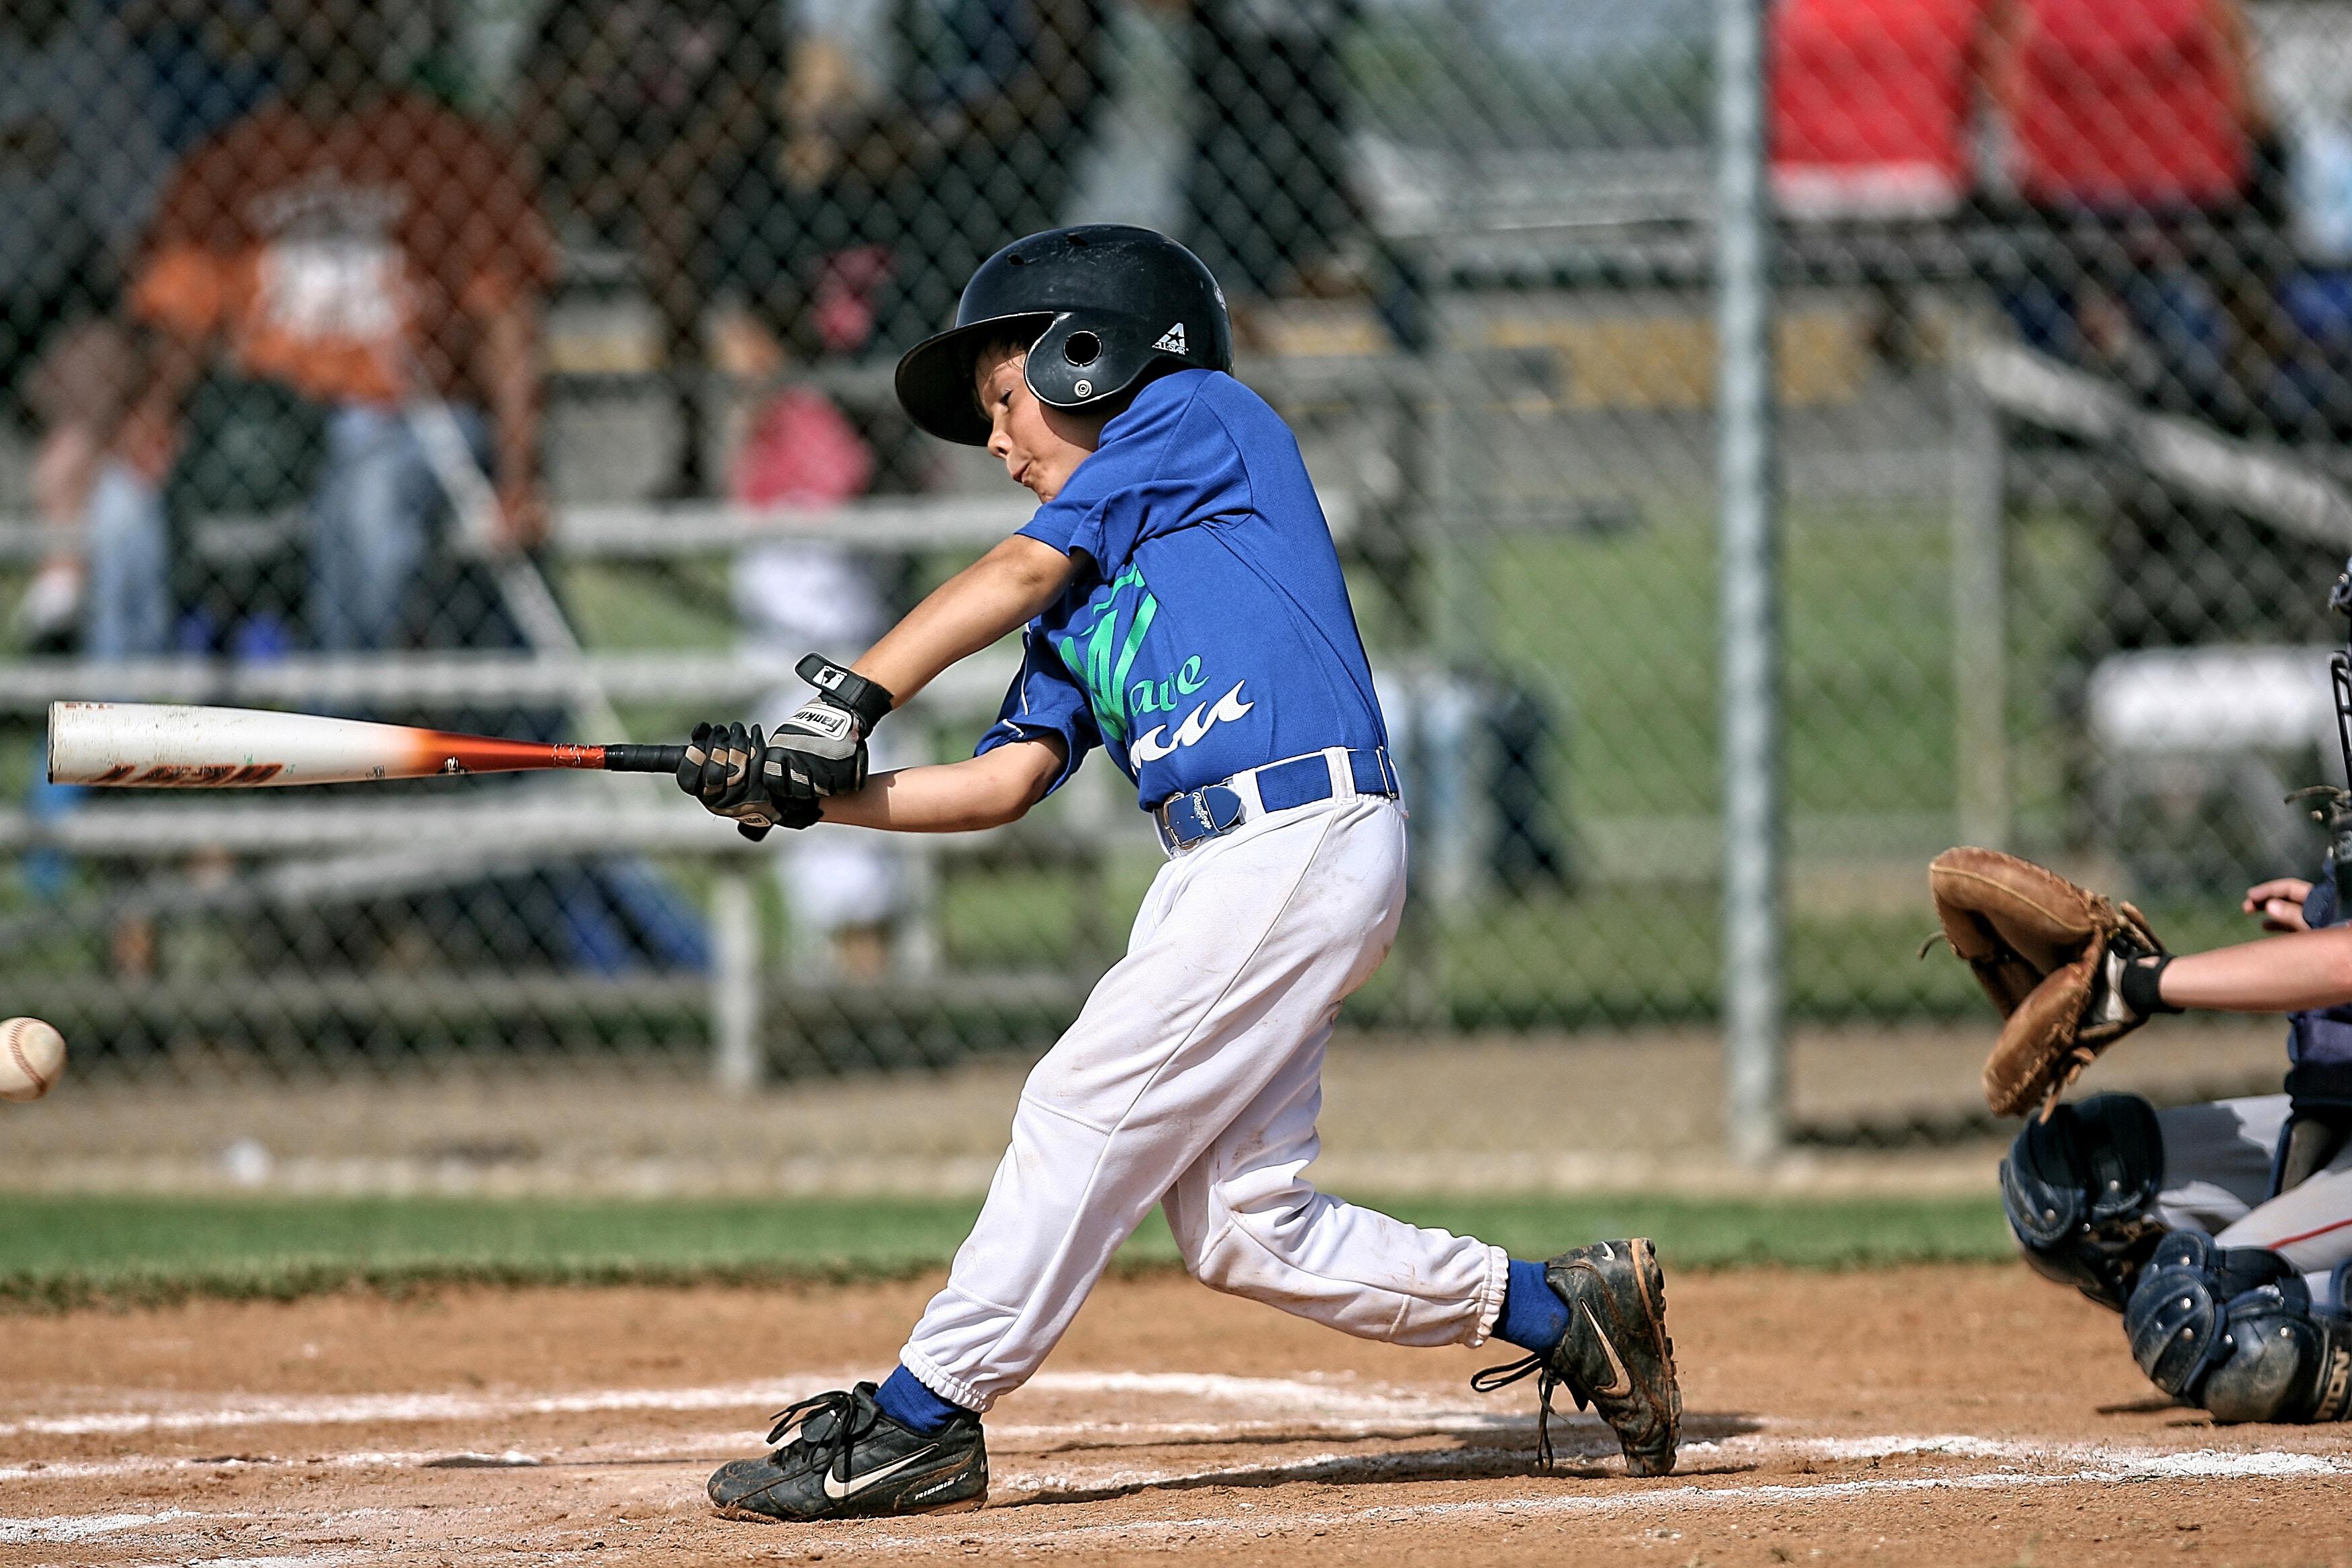 Kid hitting baseball